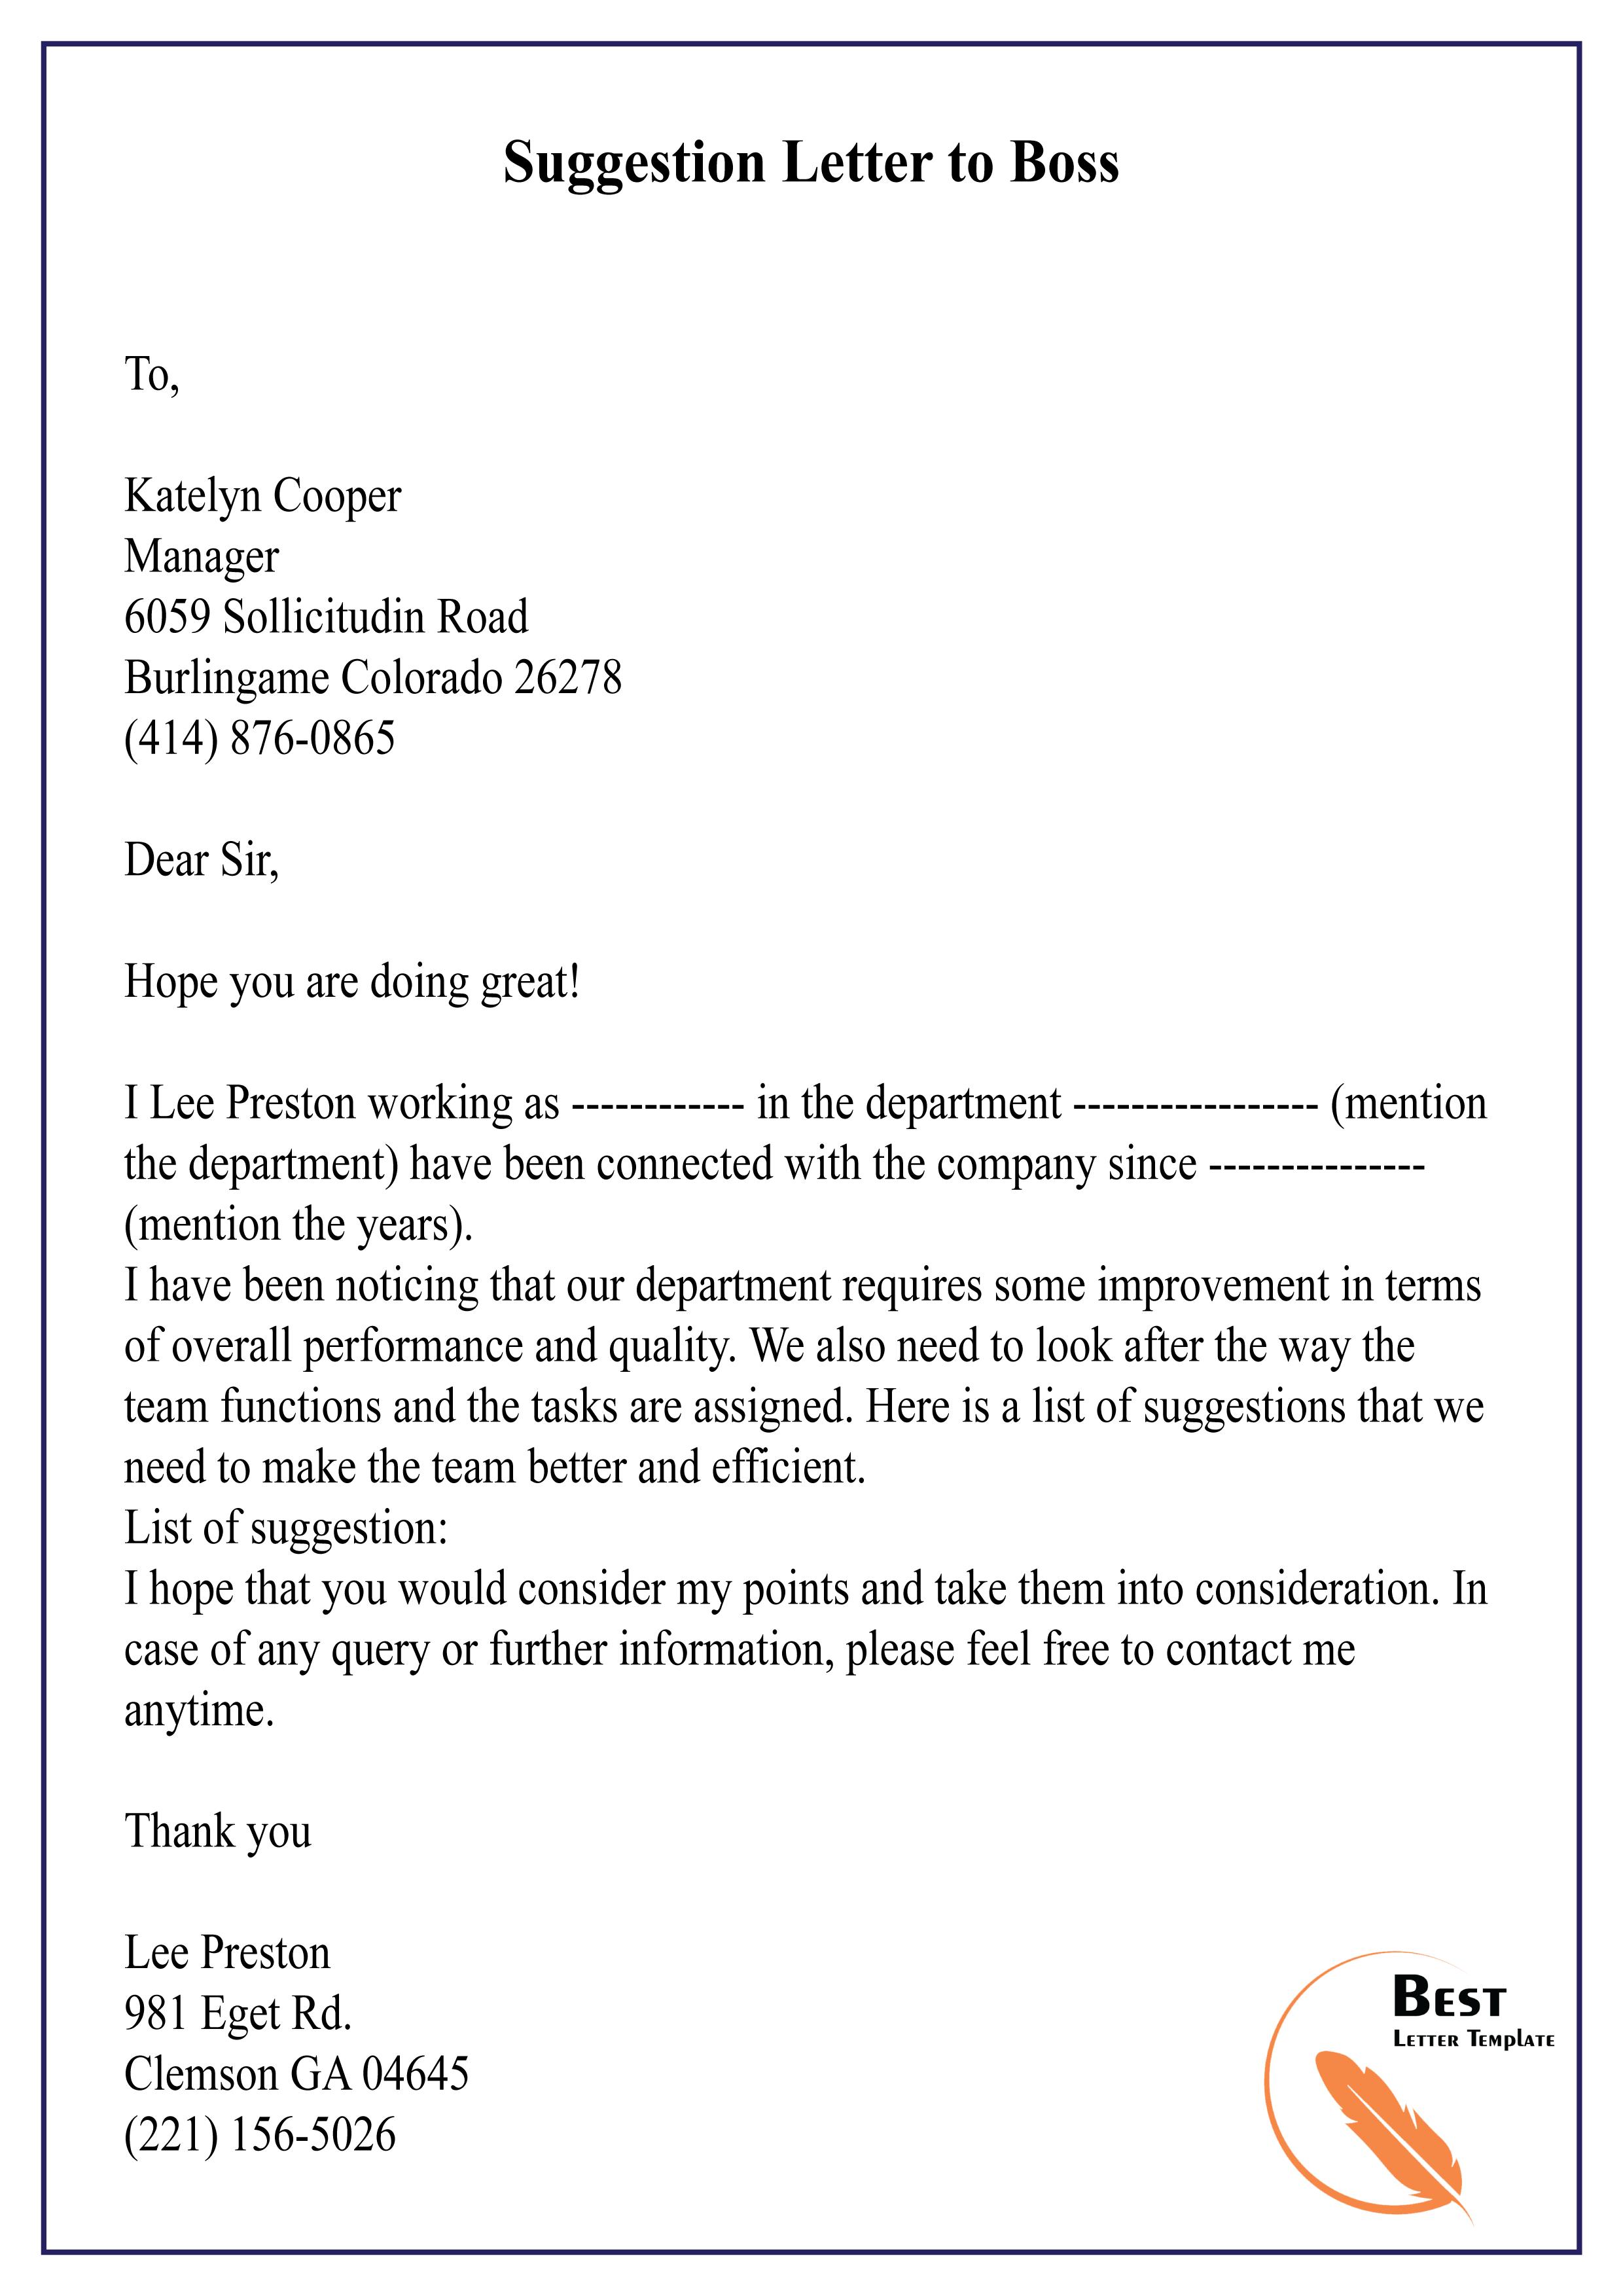 Sample Letter To Manager from bestlettertemplate.com